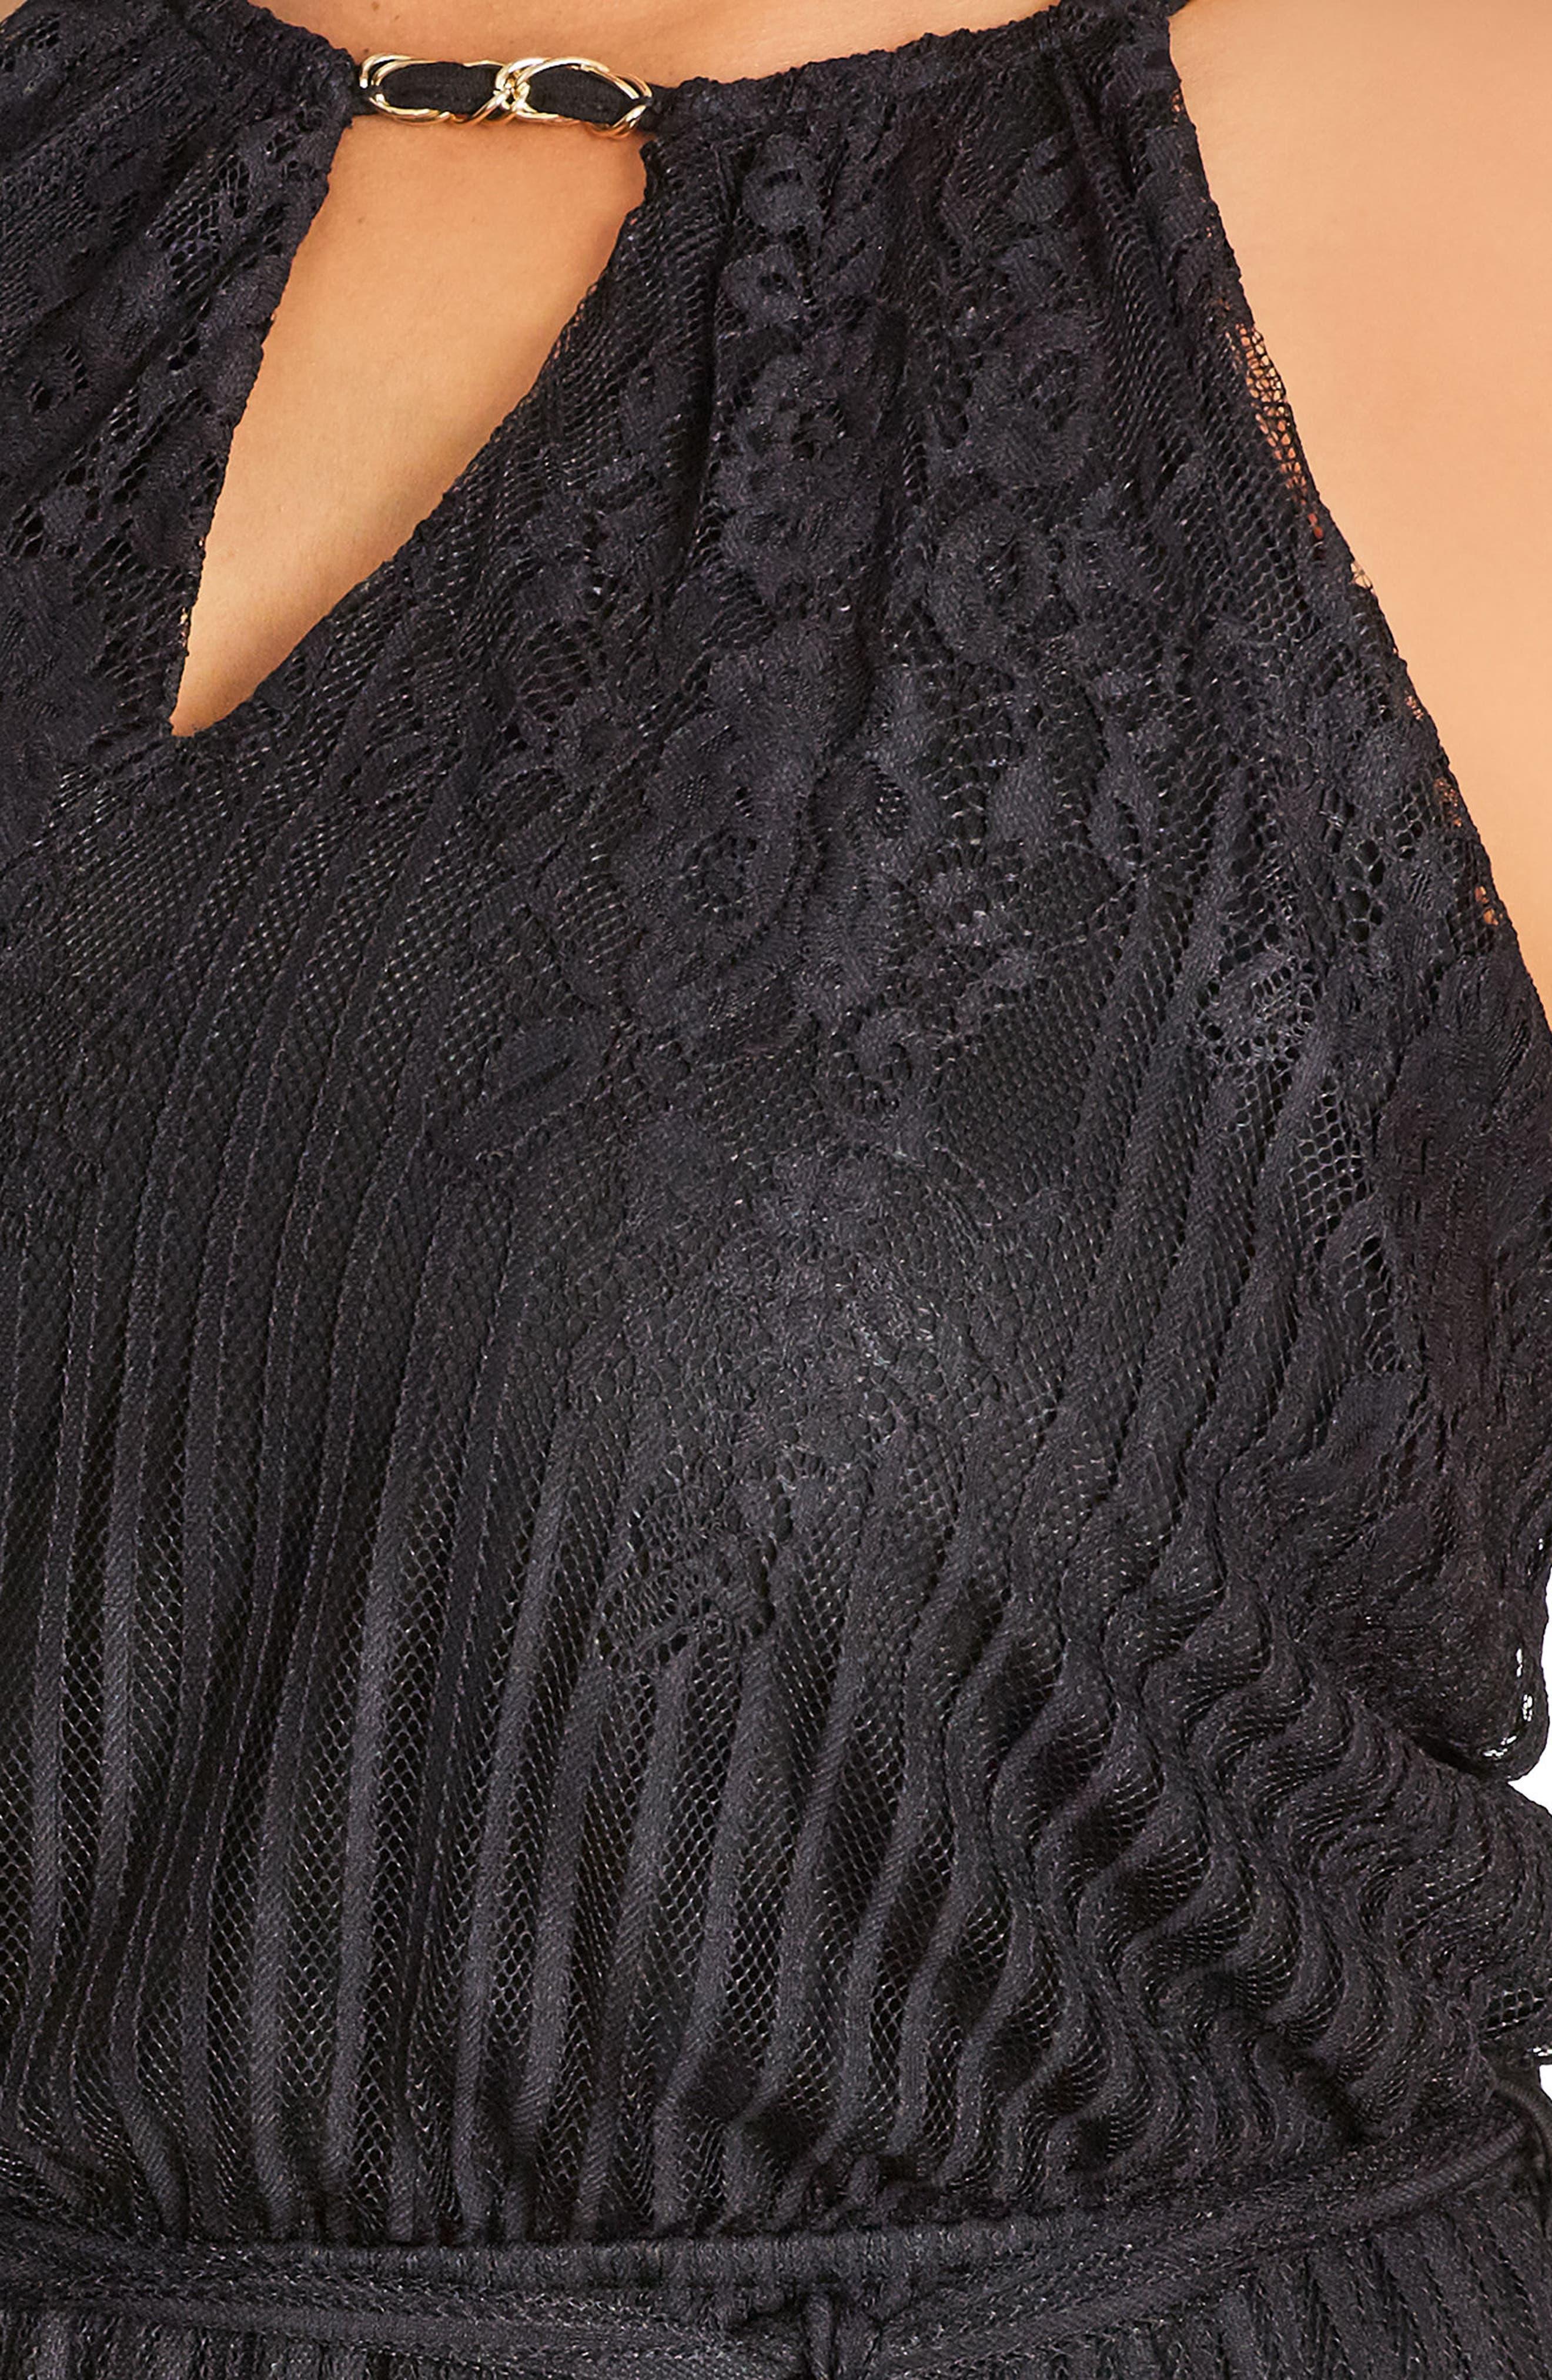 Studio 54 Stripe Lace Maxi Dress,                             Alternate thumbnail 3, color,                             001